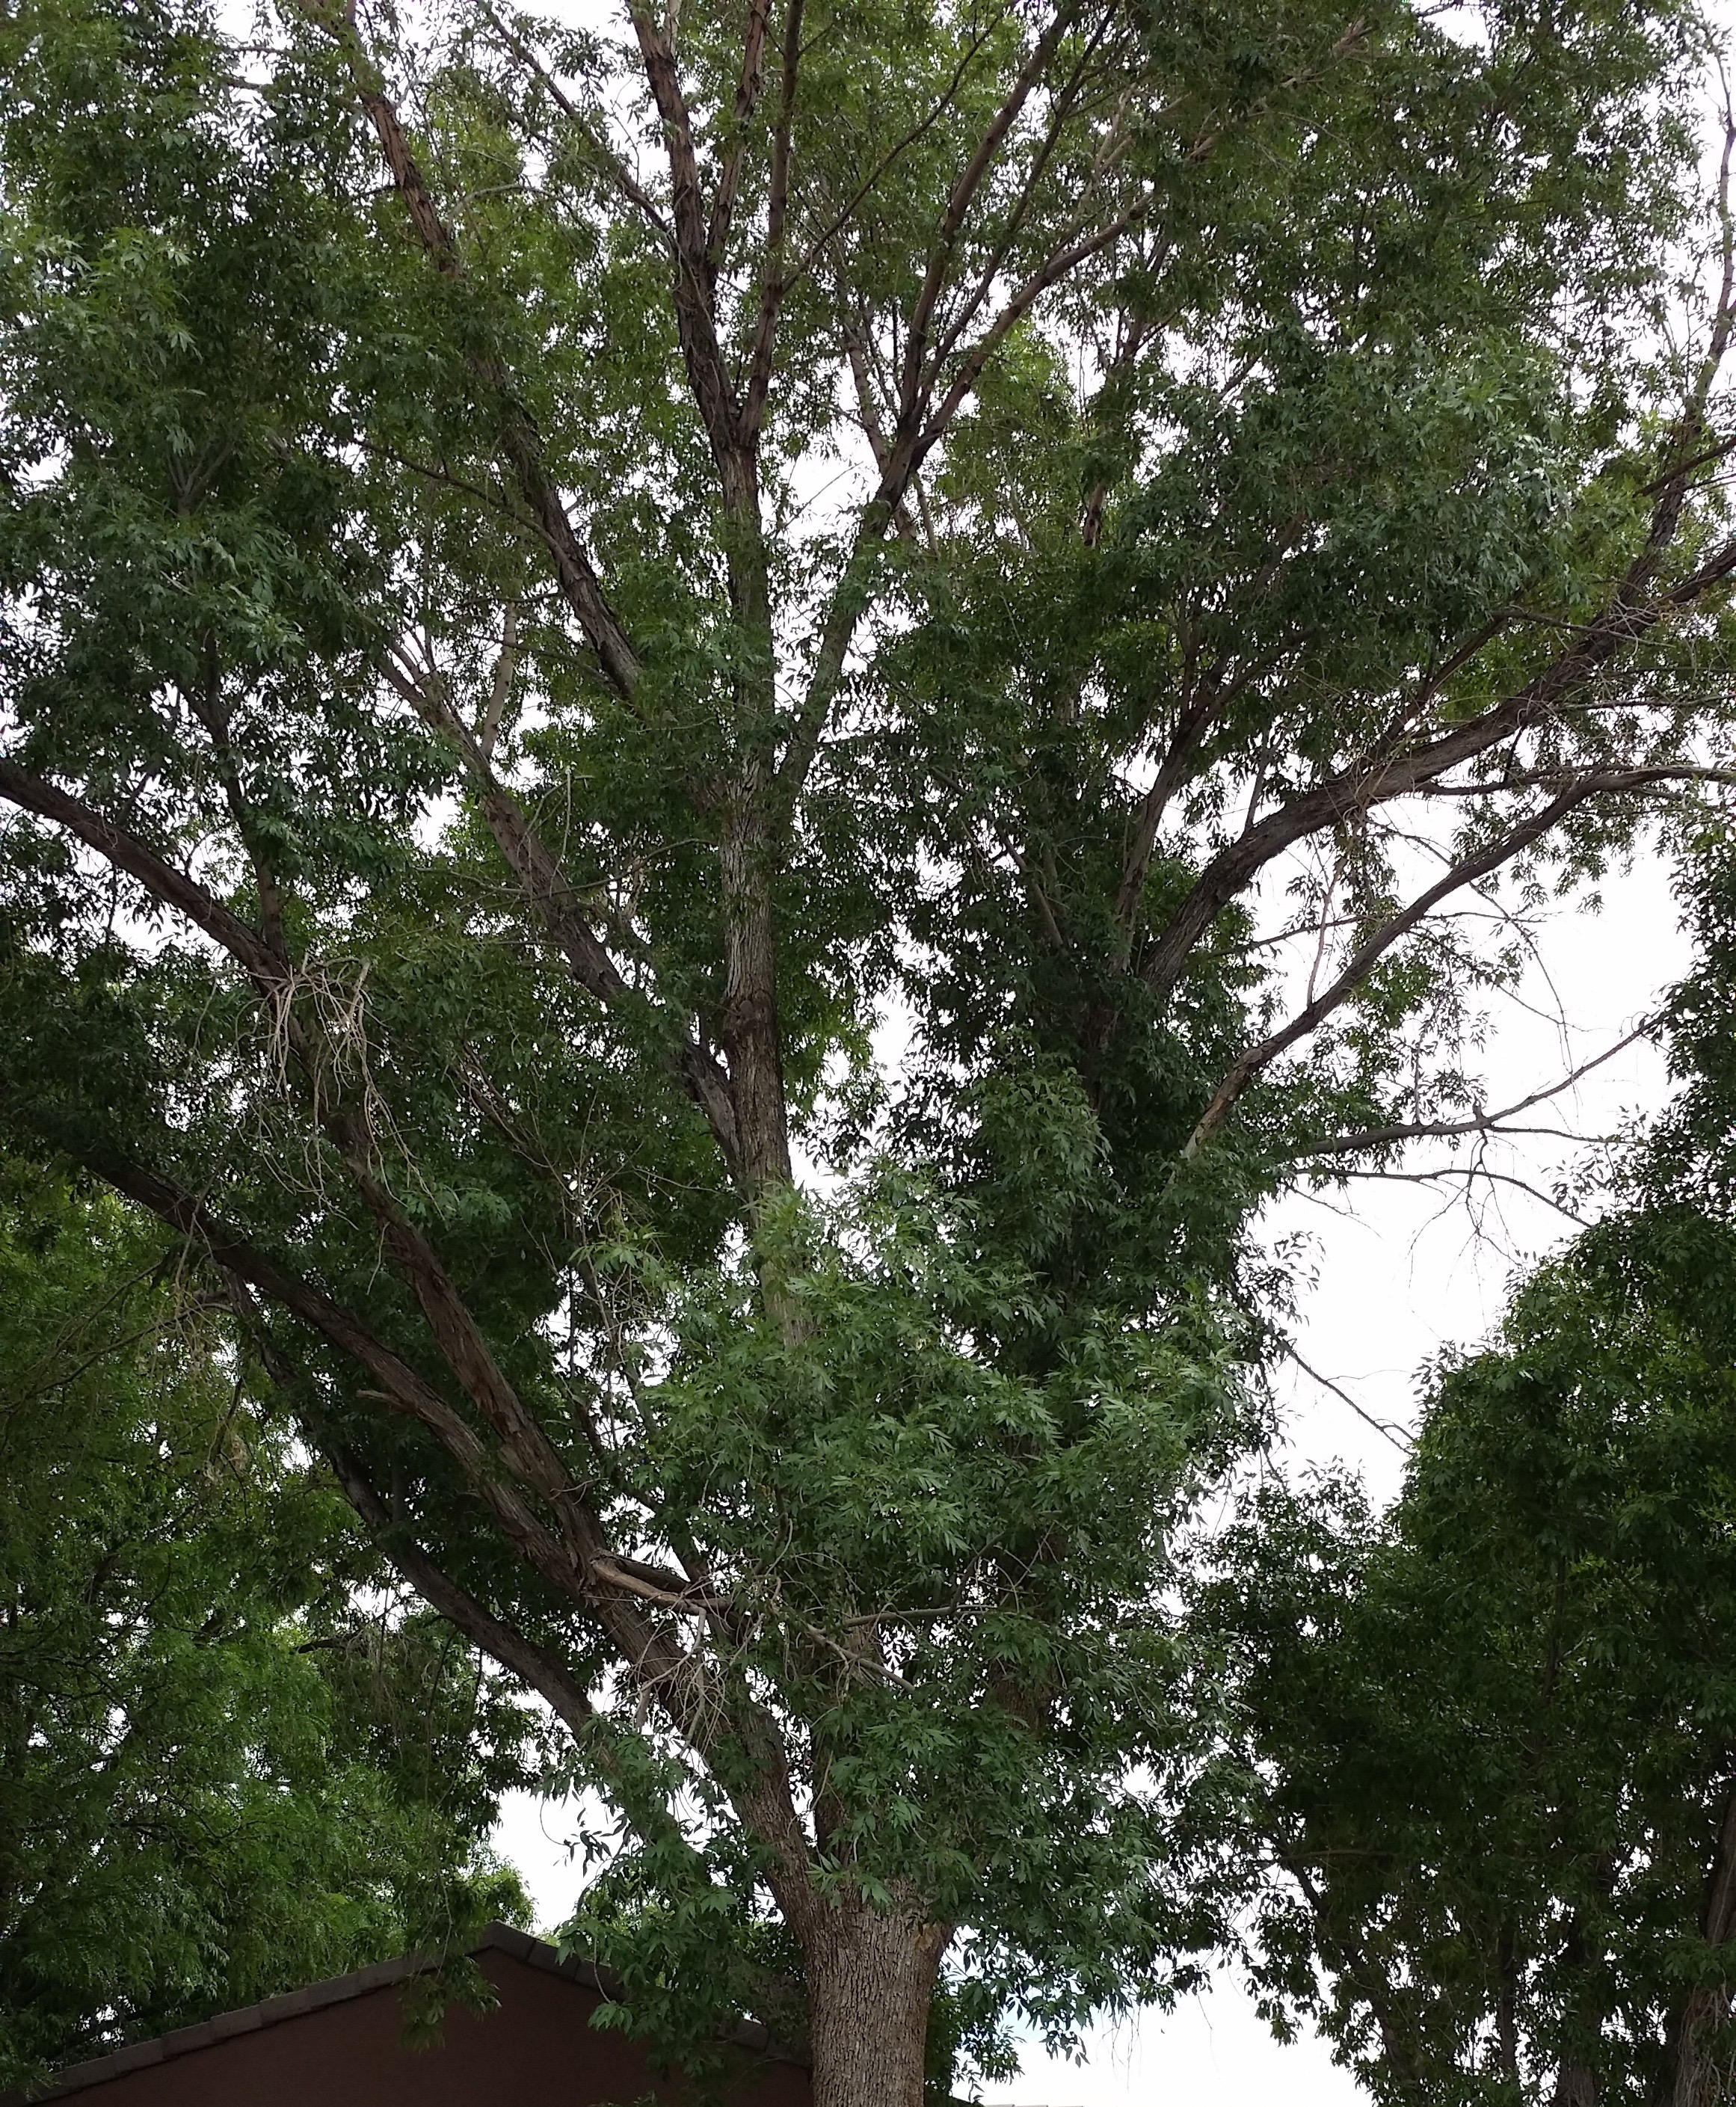 Top of Ash Tree, St. George, Utah, June 16, 2014 | Photo by Joyce Kuzmanic, St. George News